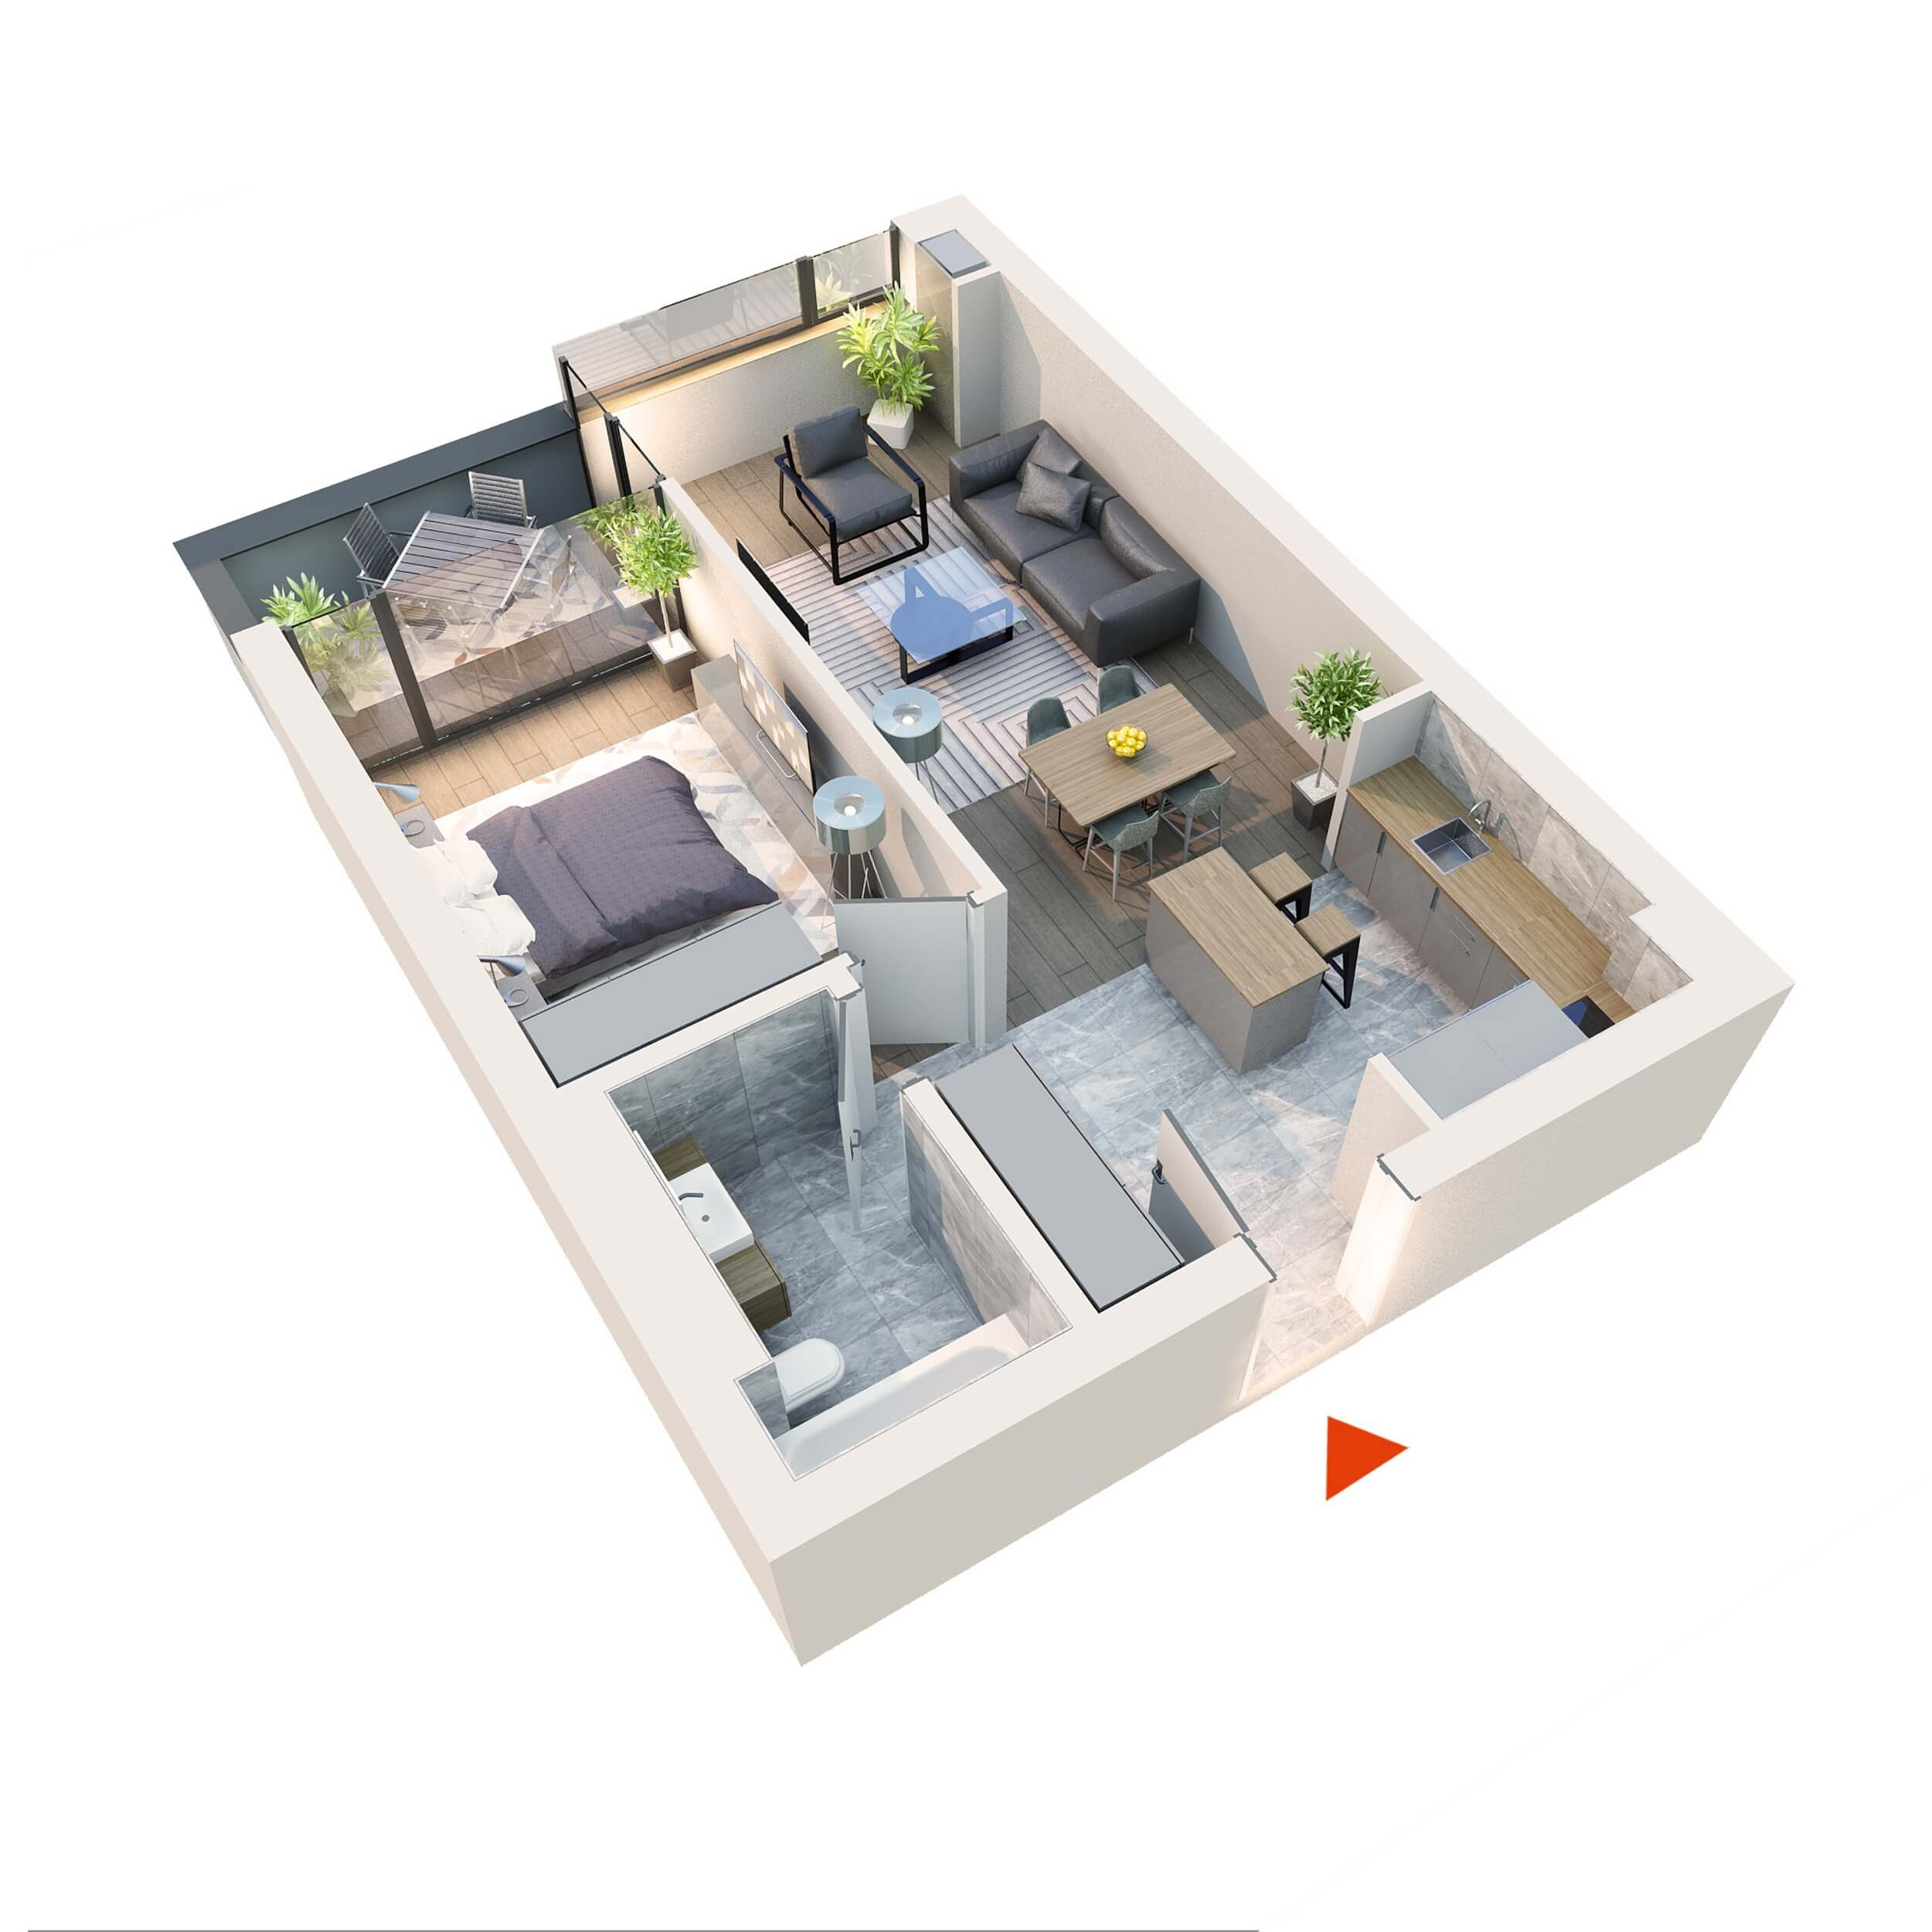 "Apartament 2 camere tip 2D1""' B12 Logie | Etaj 1-3 | Corp C8 | Faza 2"